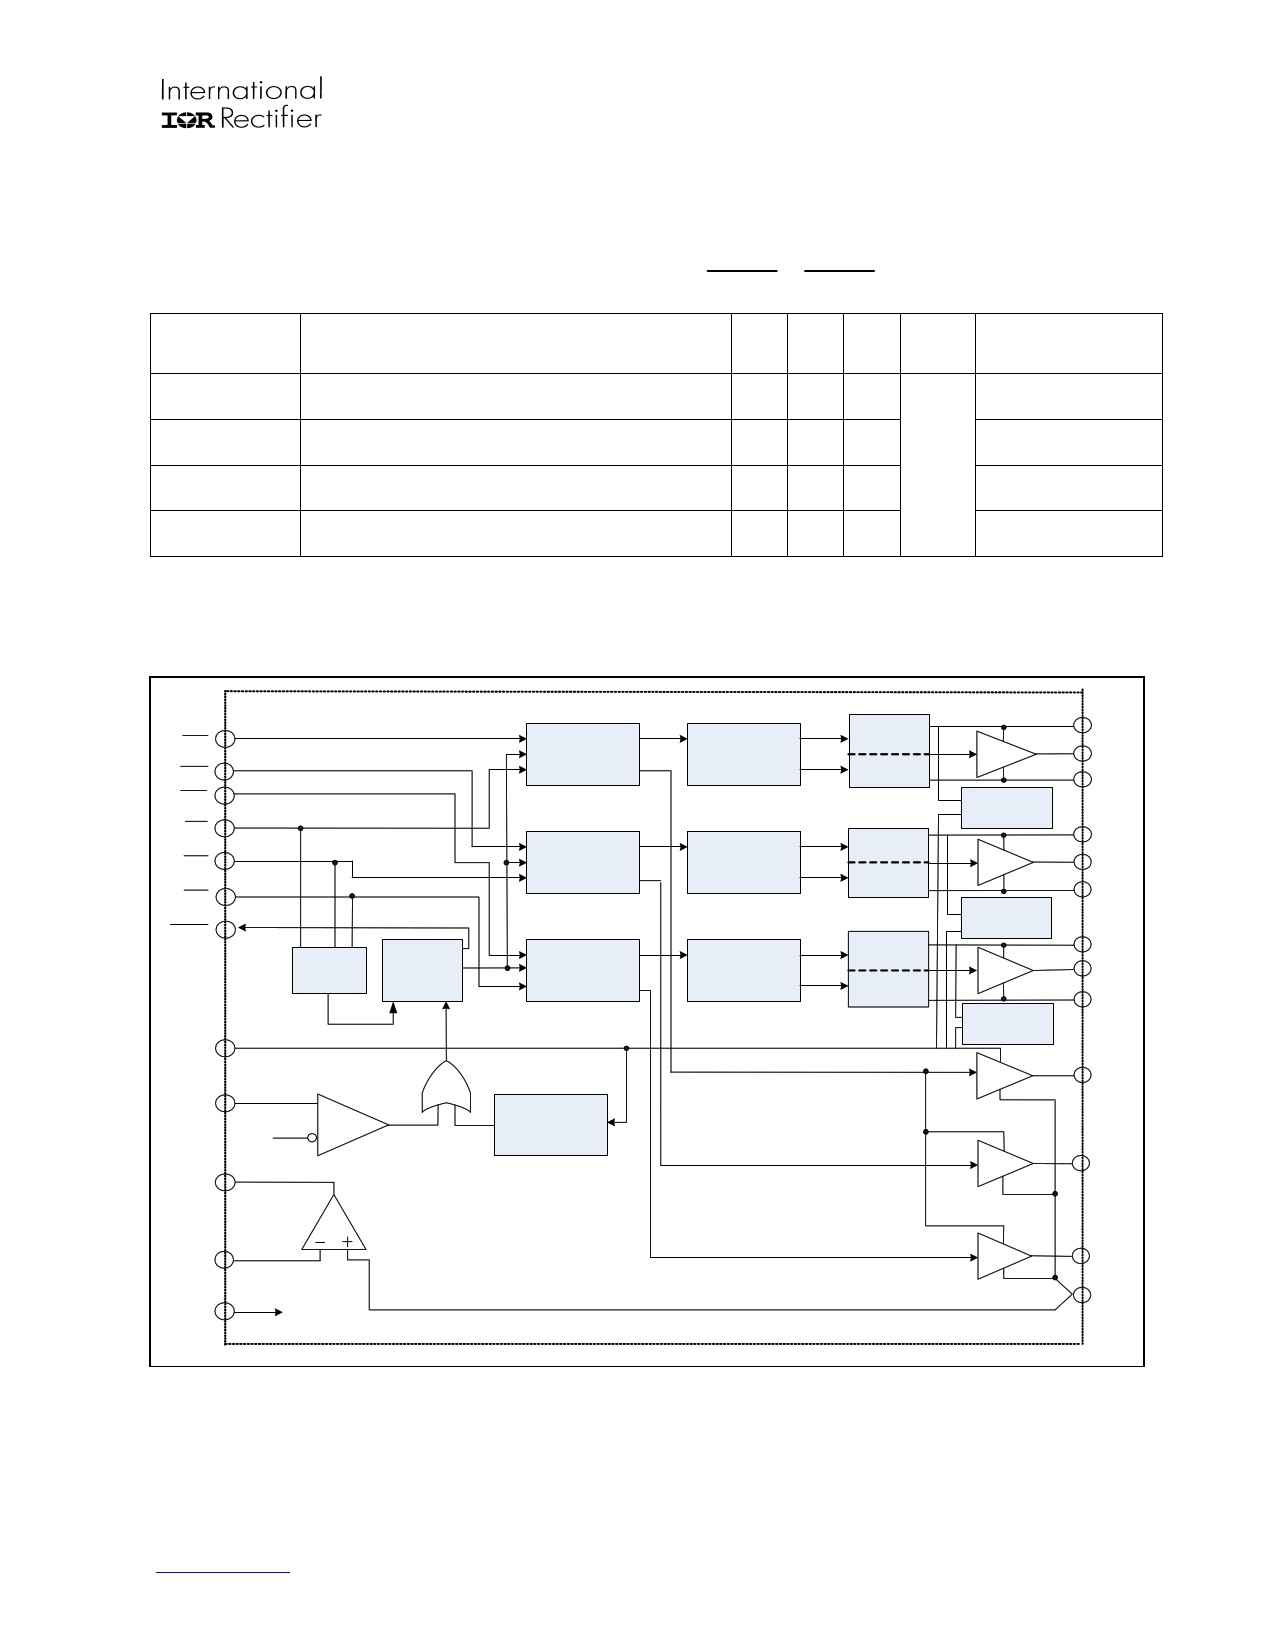 3 Phase Electrical Wiring Diagram 6 Lead Motor 3phase6leadmotorwiring Datasheet Irs233jpbf Bridge Driver Page Pdf Of